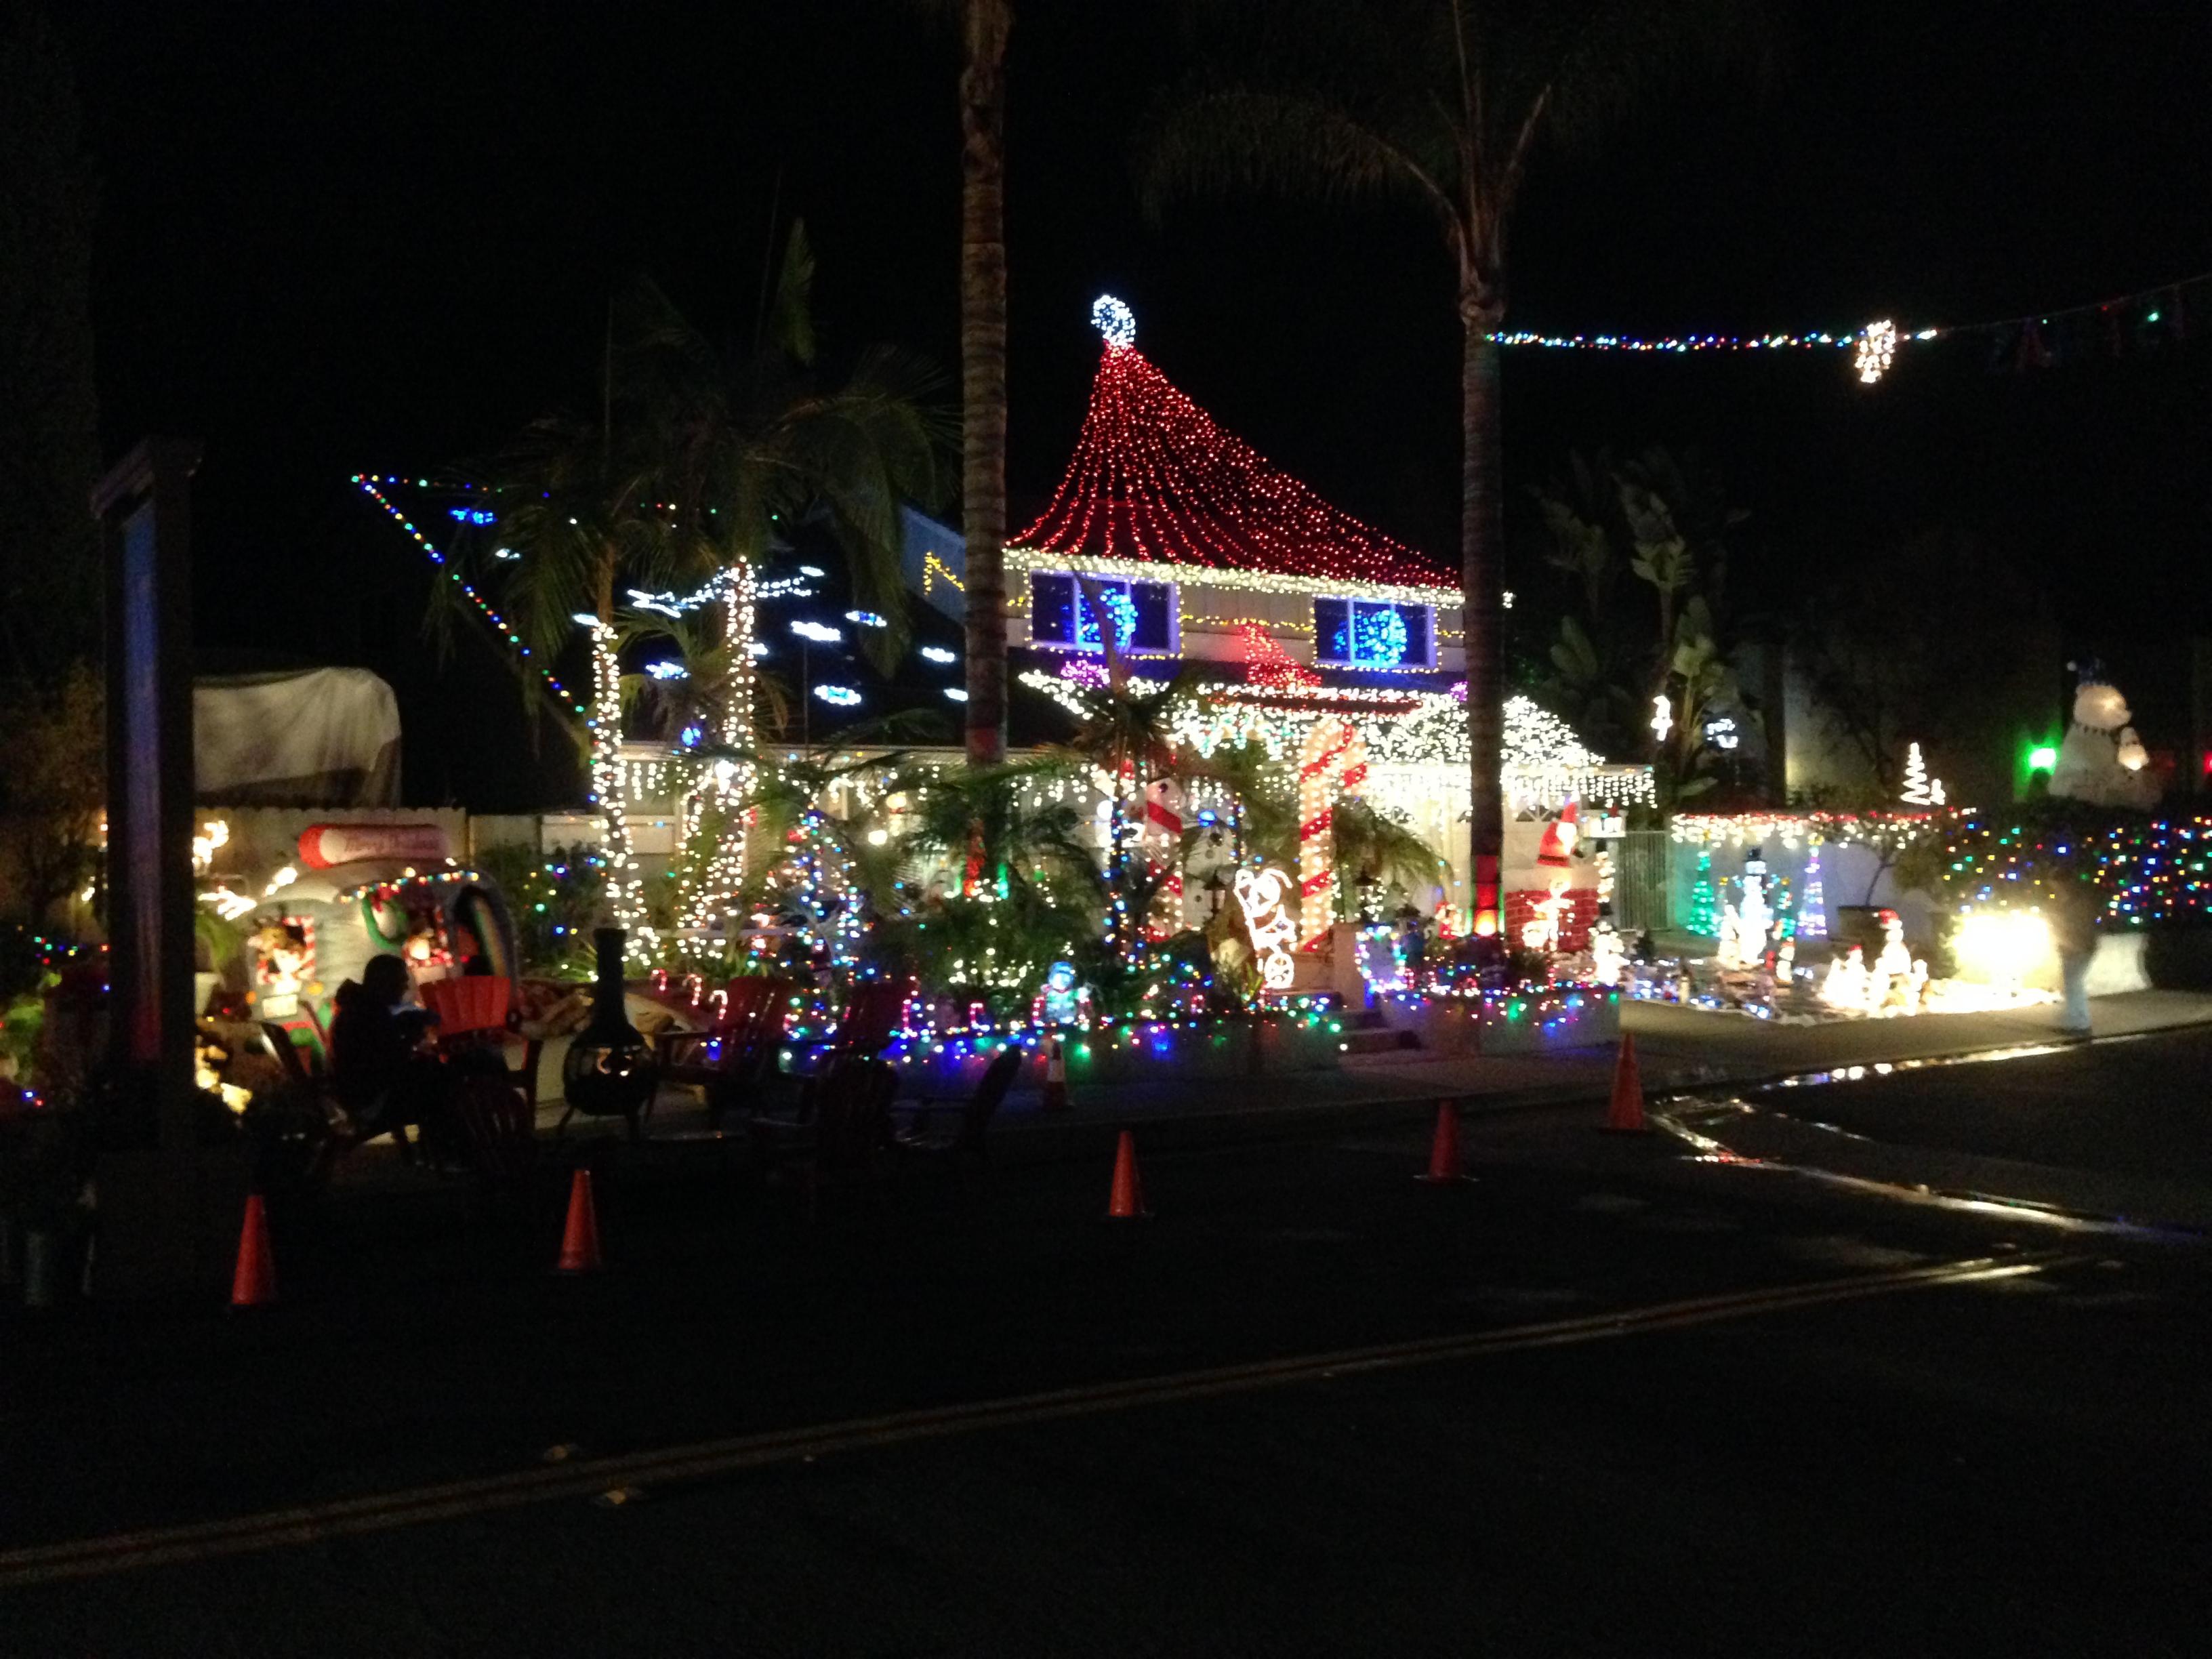 christmas lights holiday lights mission viejo - Driveway Christmas Lights